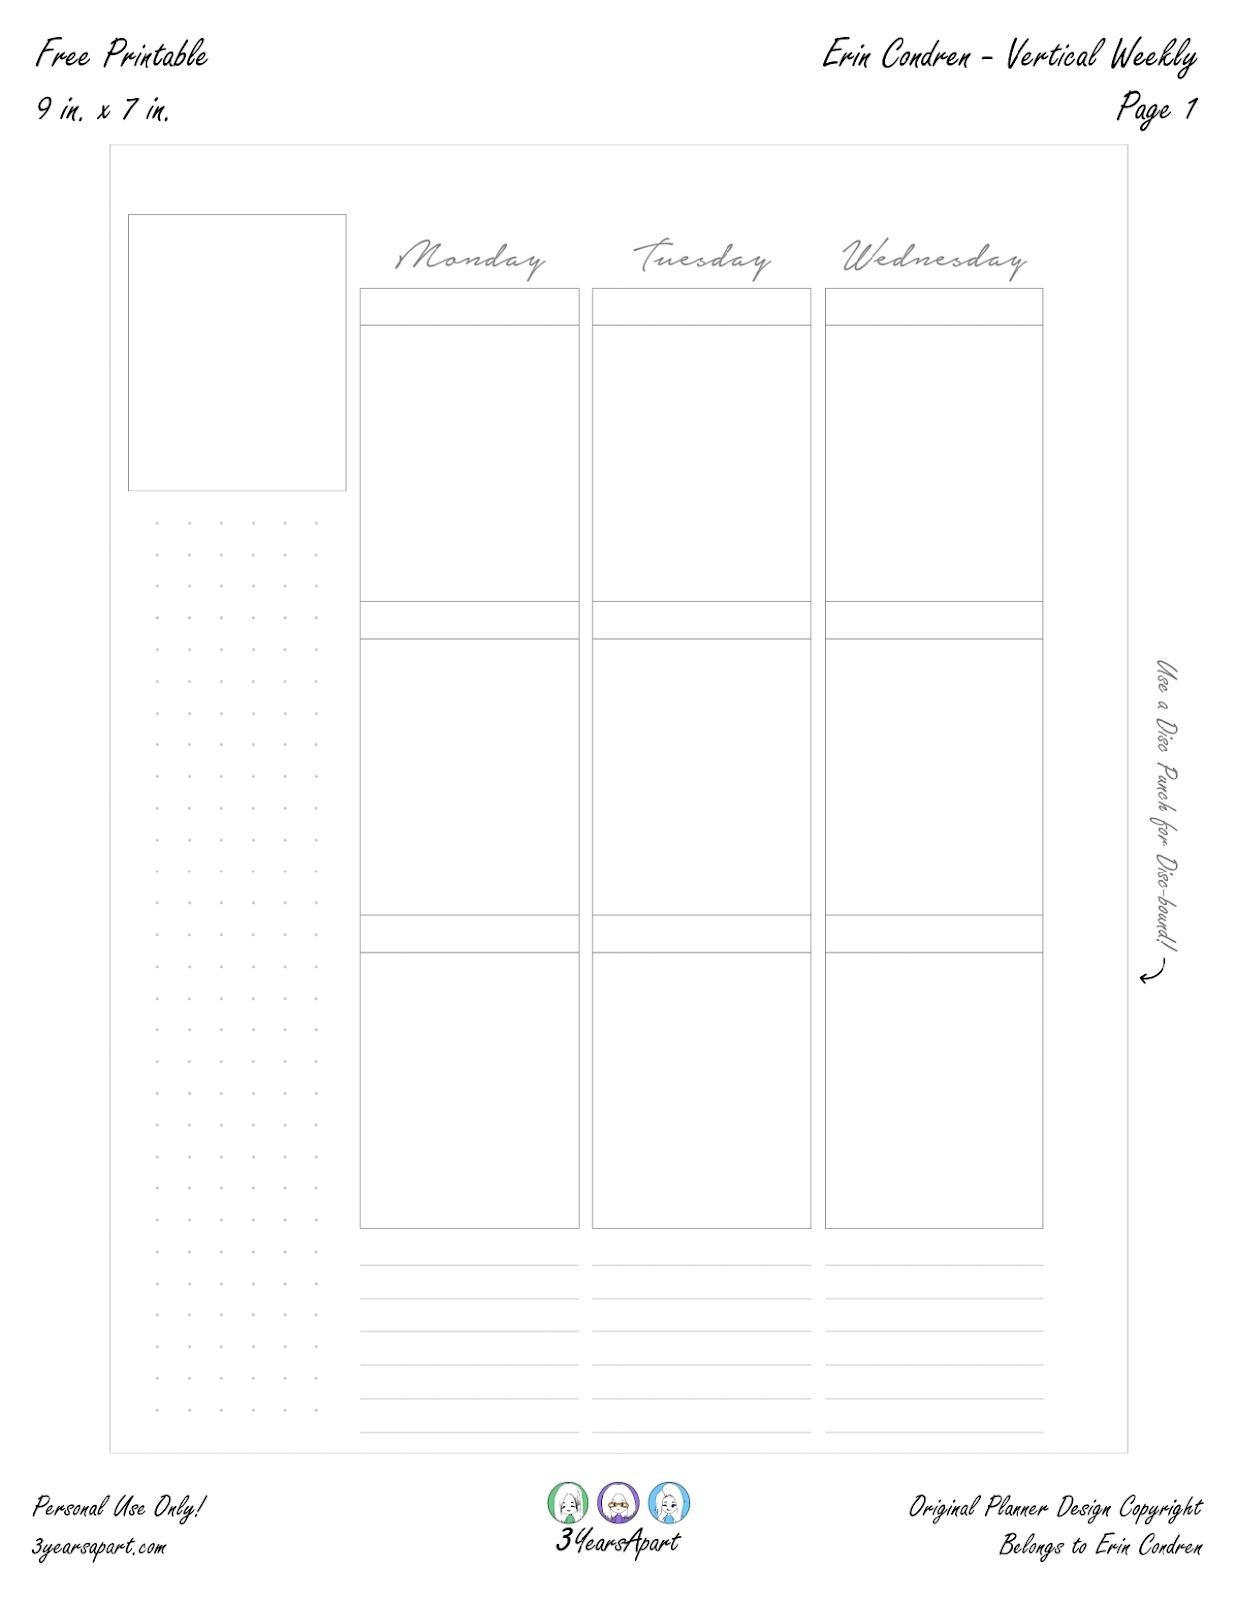 Free Planner Printable - Vertical Weekly Inserts - Ring